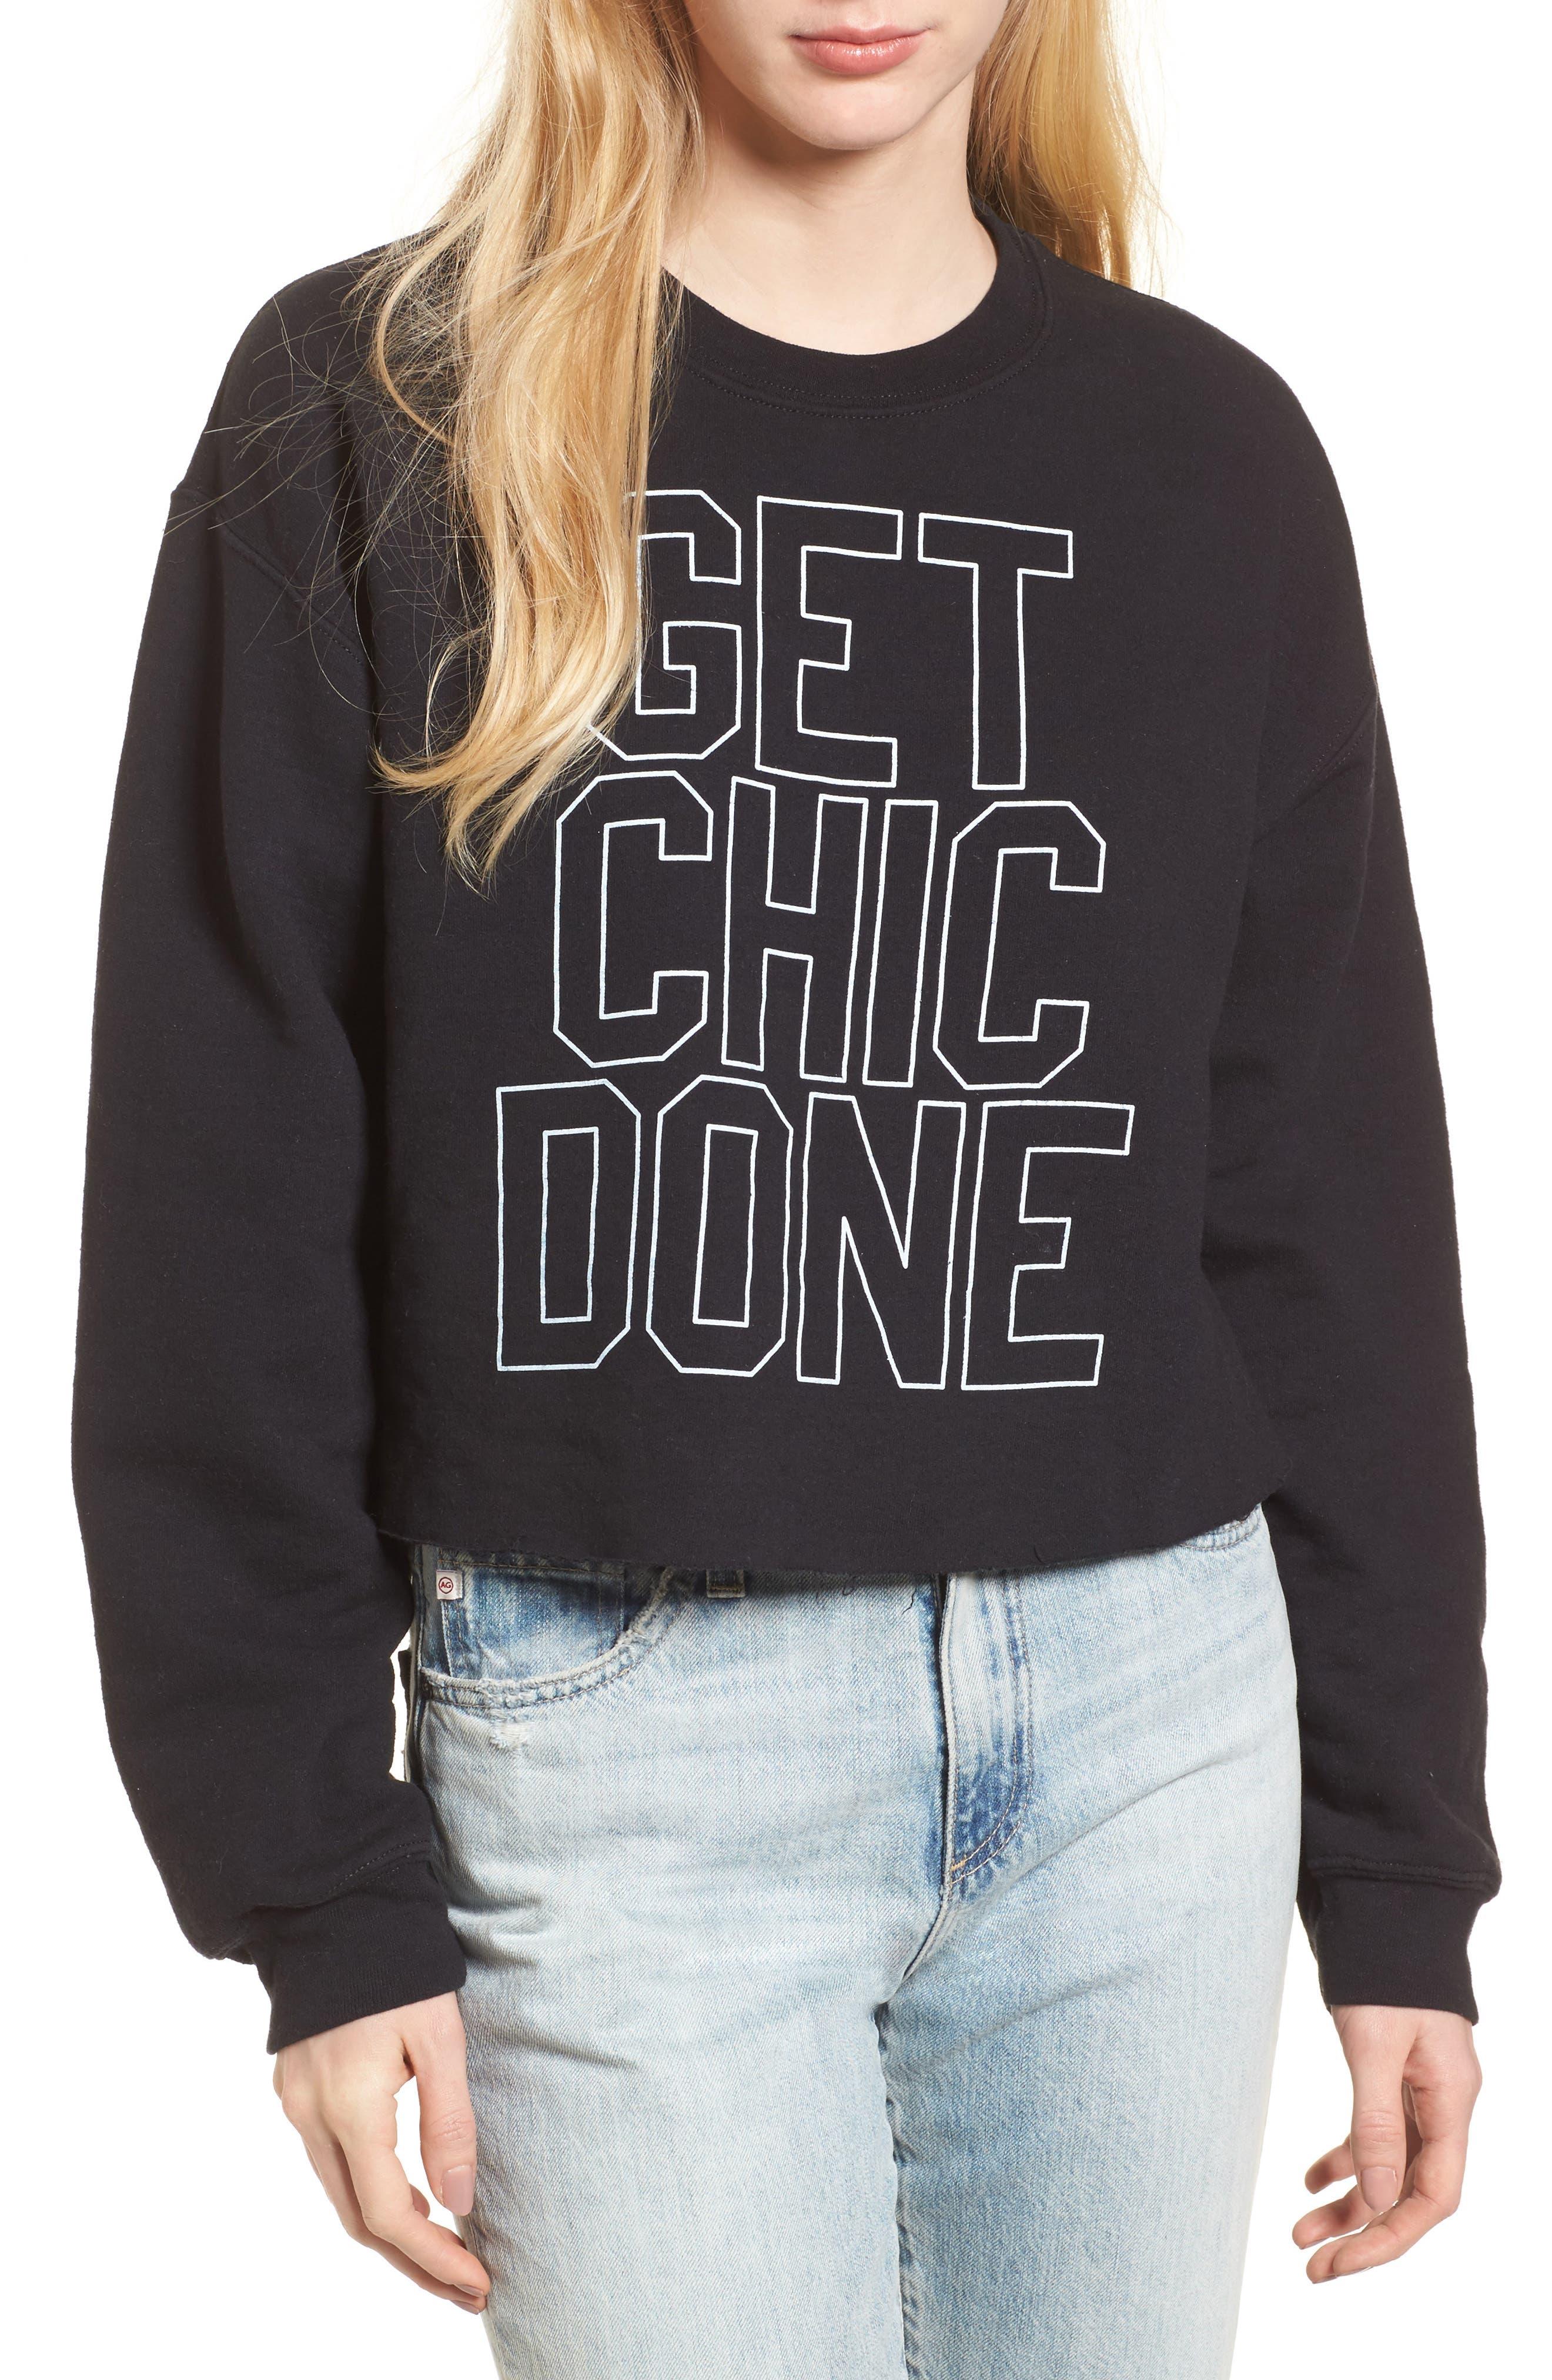 Junk Food Get Chic Done Sweatshirt